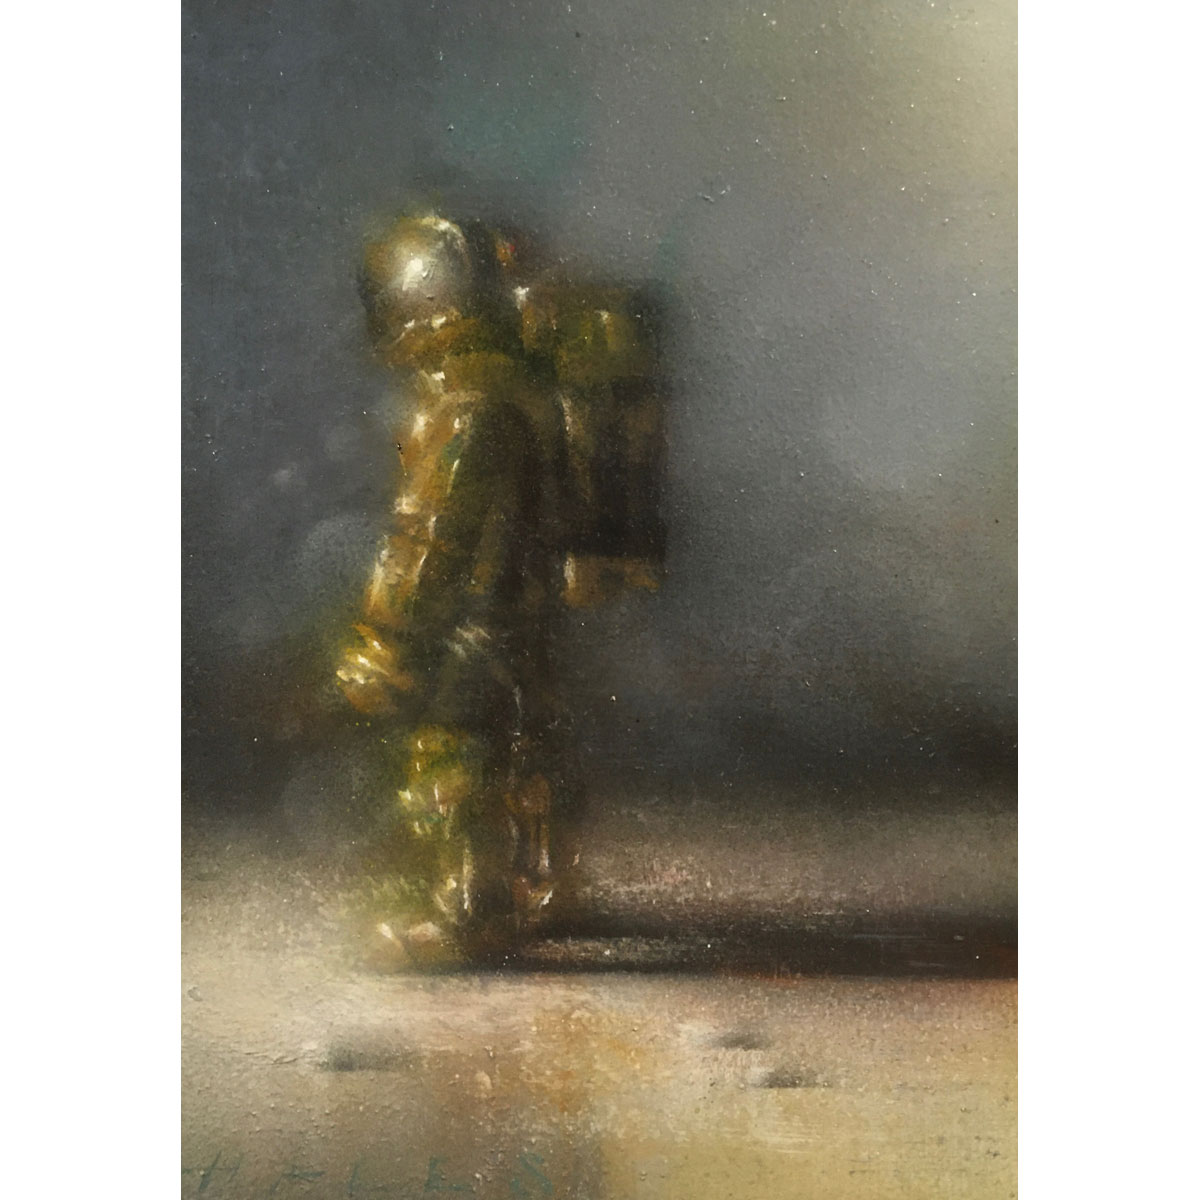 Wanderer by C.J. Hales